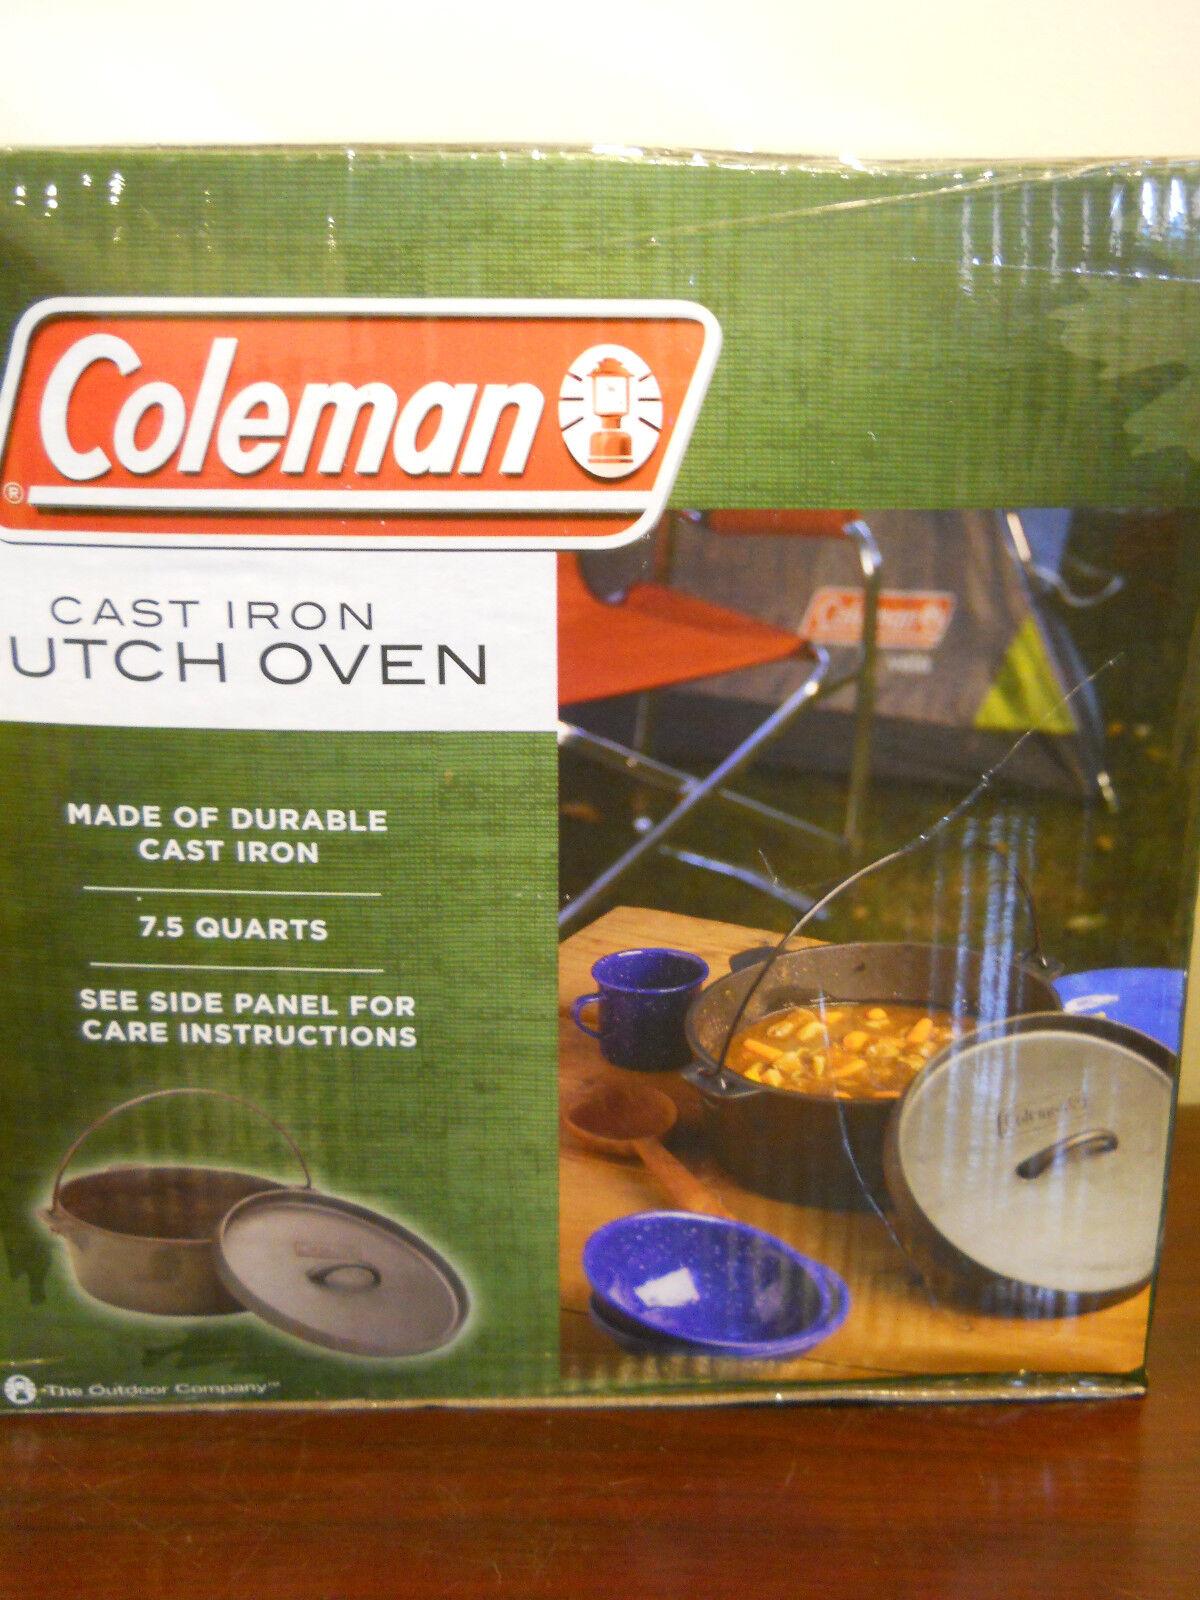 NEW COLEMAN CAMPING CAST IRON DUTCH OVEN POT LID 7.5 QT HANDLE COOKING COOKWARE